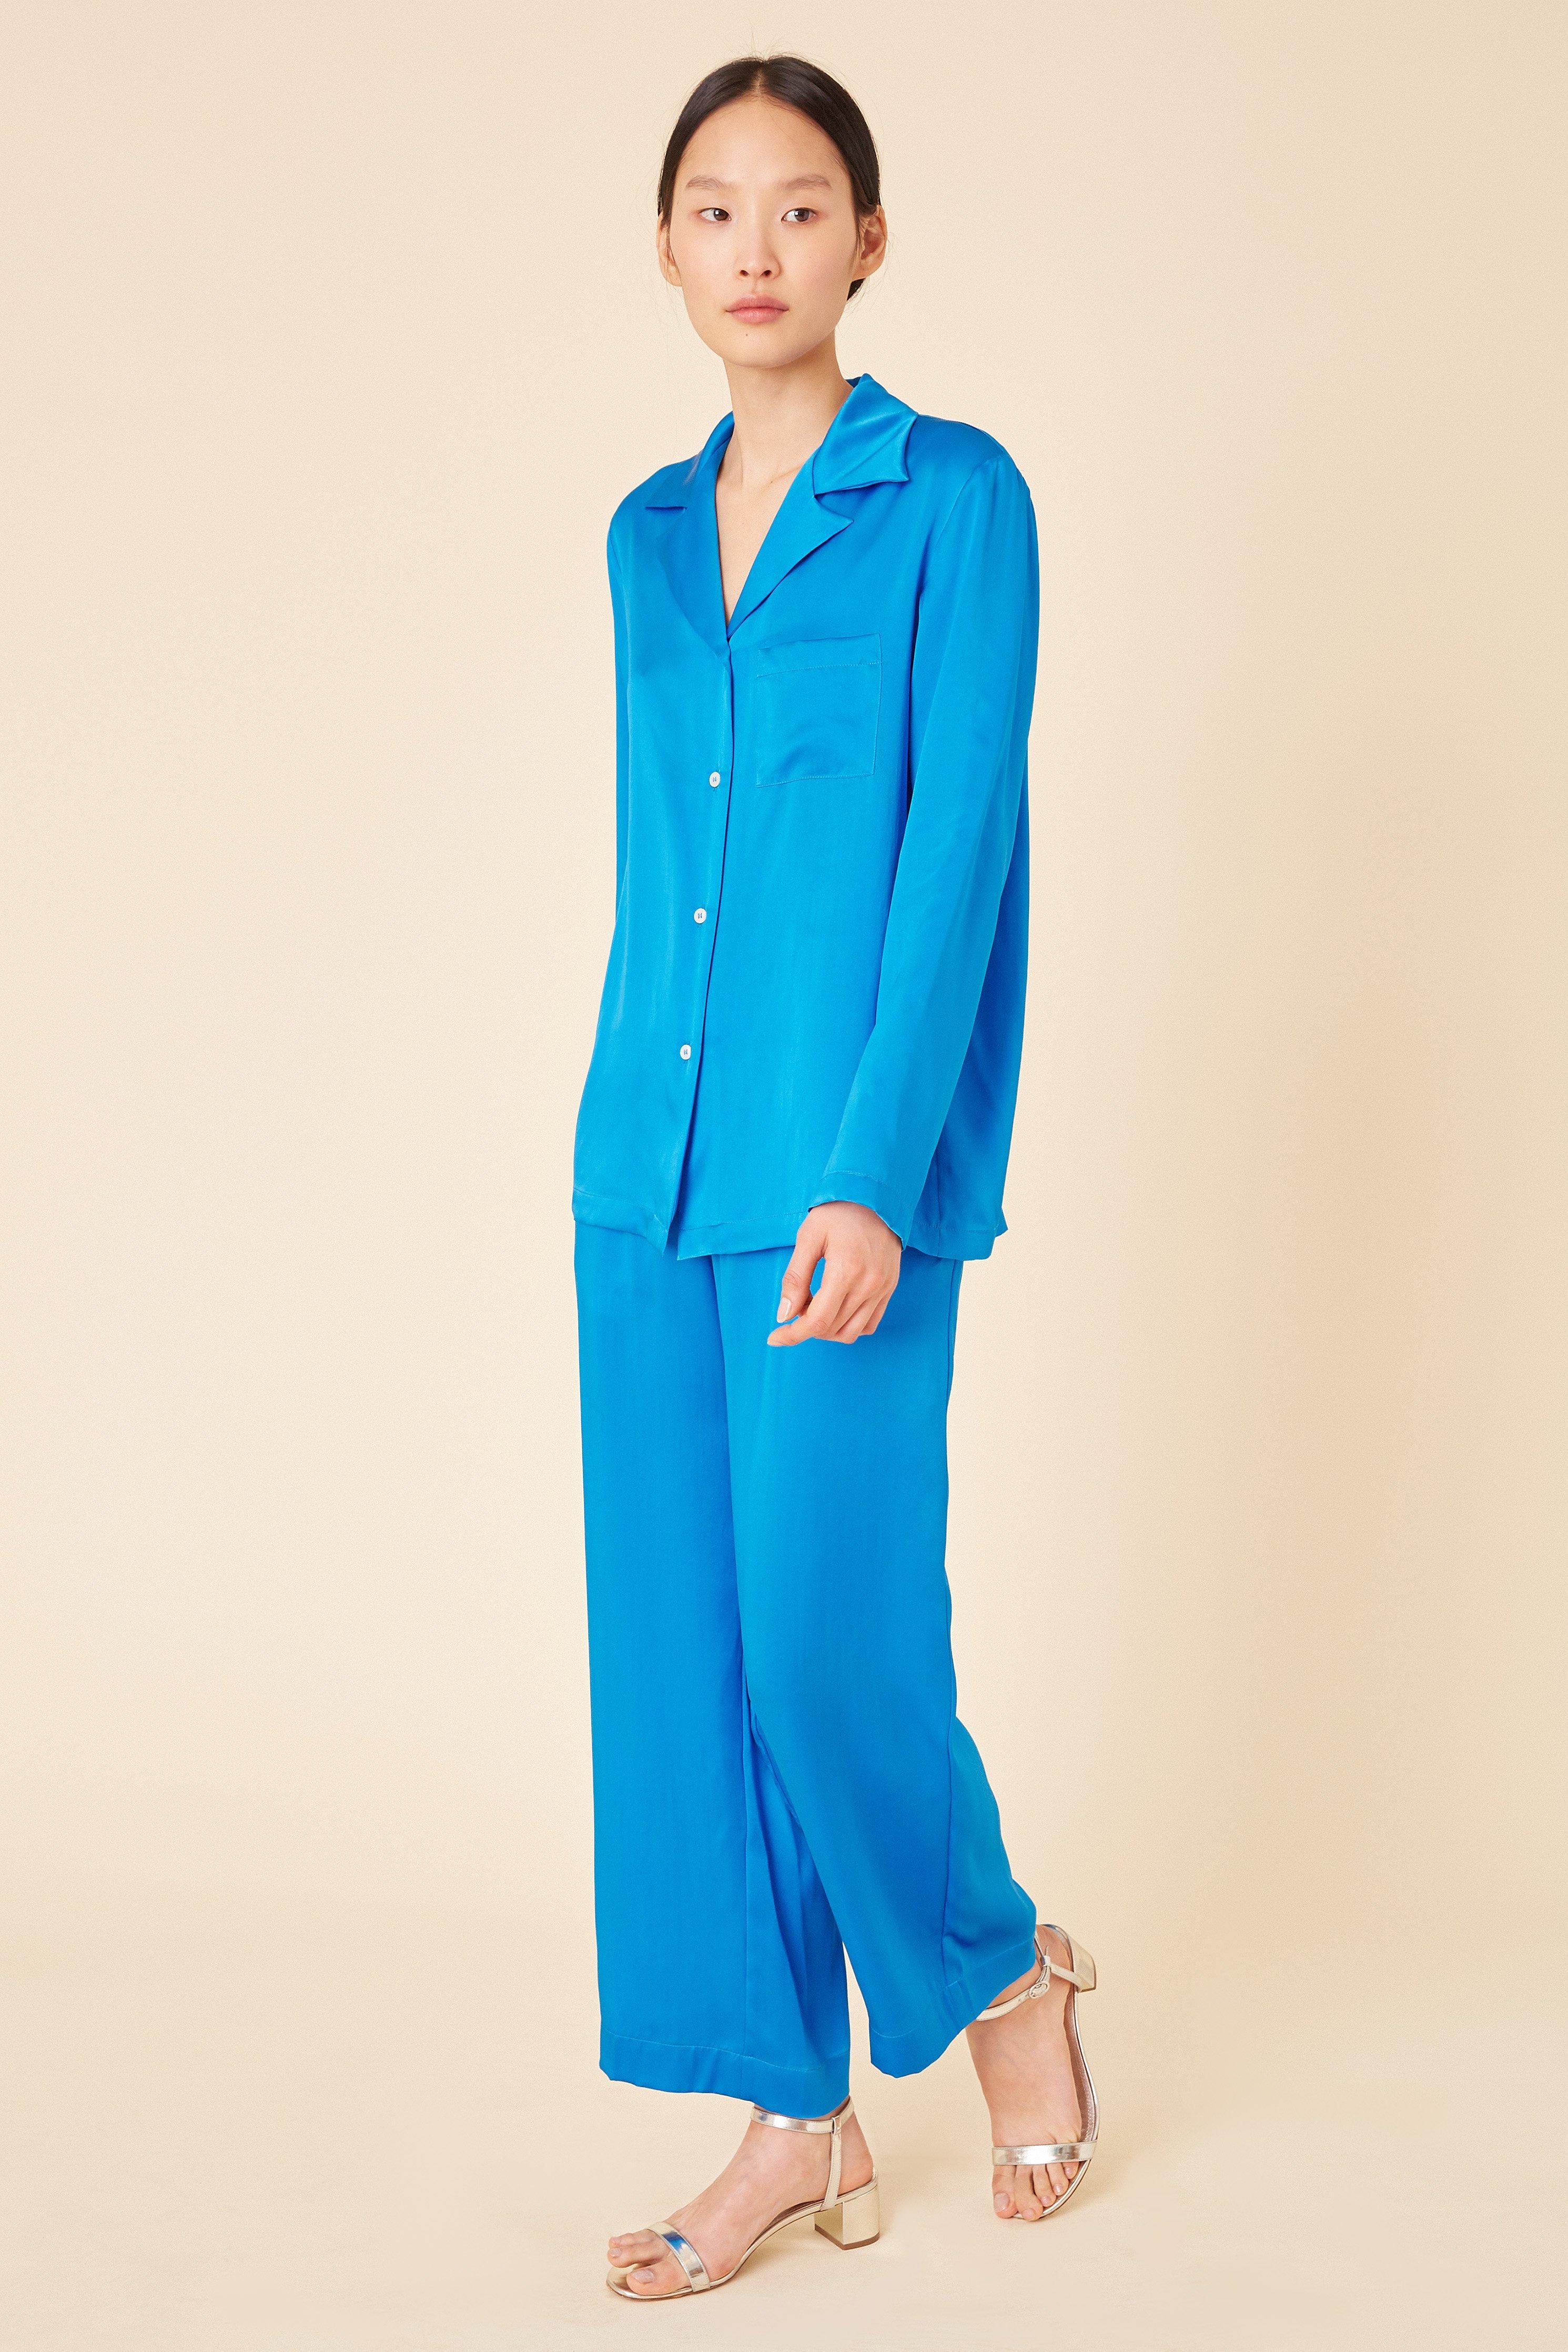 b599304e687d9 Mansur Gavriel - Blue Silk Charmeuse Pajama Shirt - Royal - Lyst. View  fullscreen